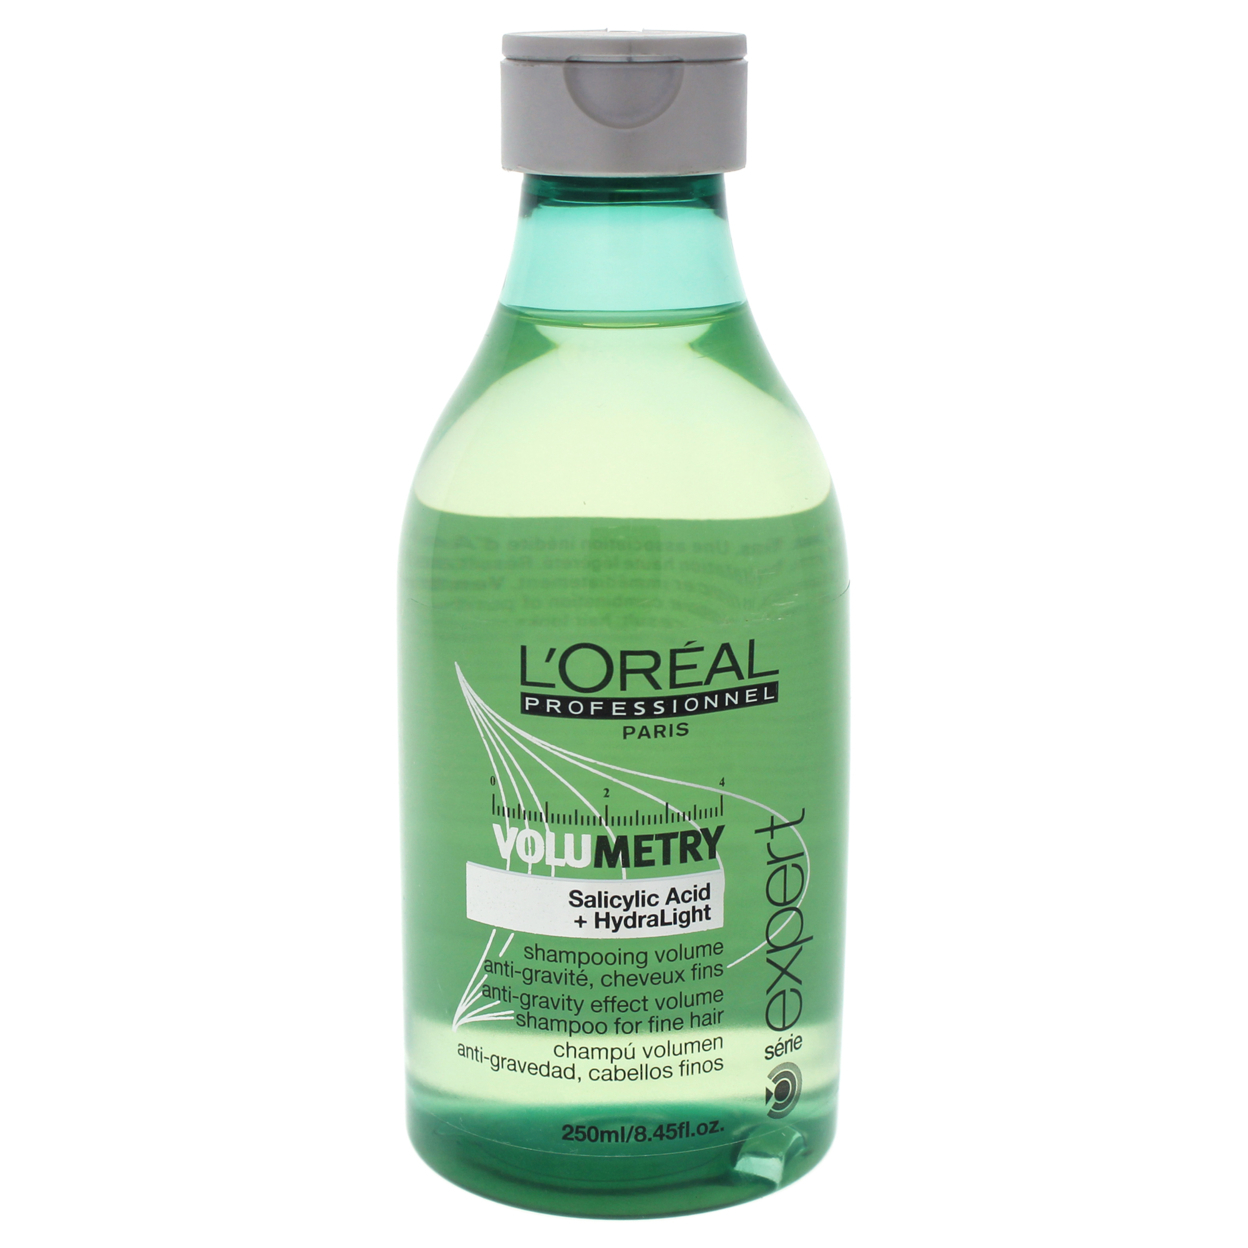 Serie Expert Volumetry Anti-Gravity Effect Volume Shampoo by L'Oreal for Unisex - 8.45 oz Shampoo 59b3d45c2a00e46a9671ac01